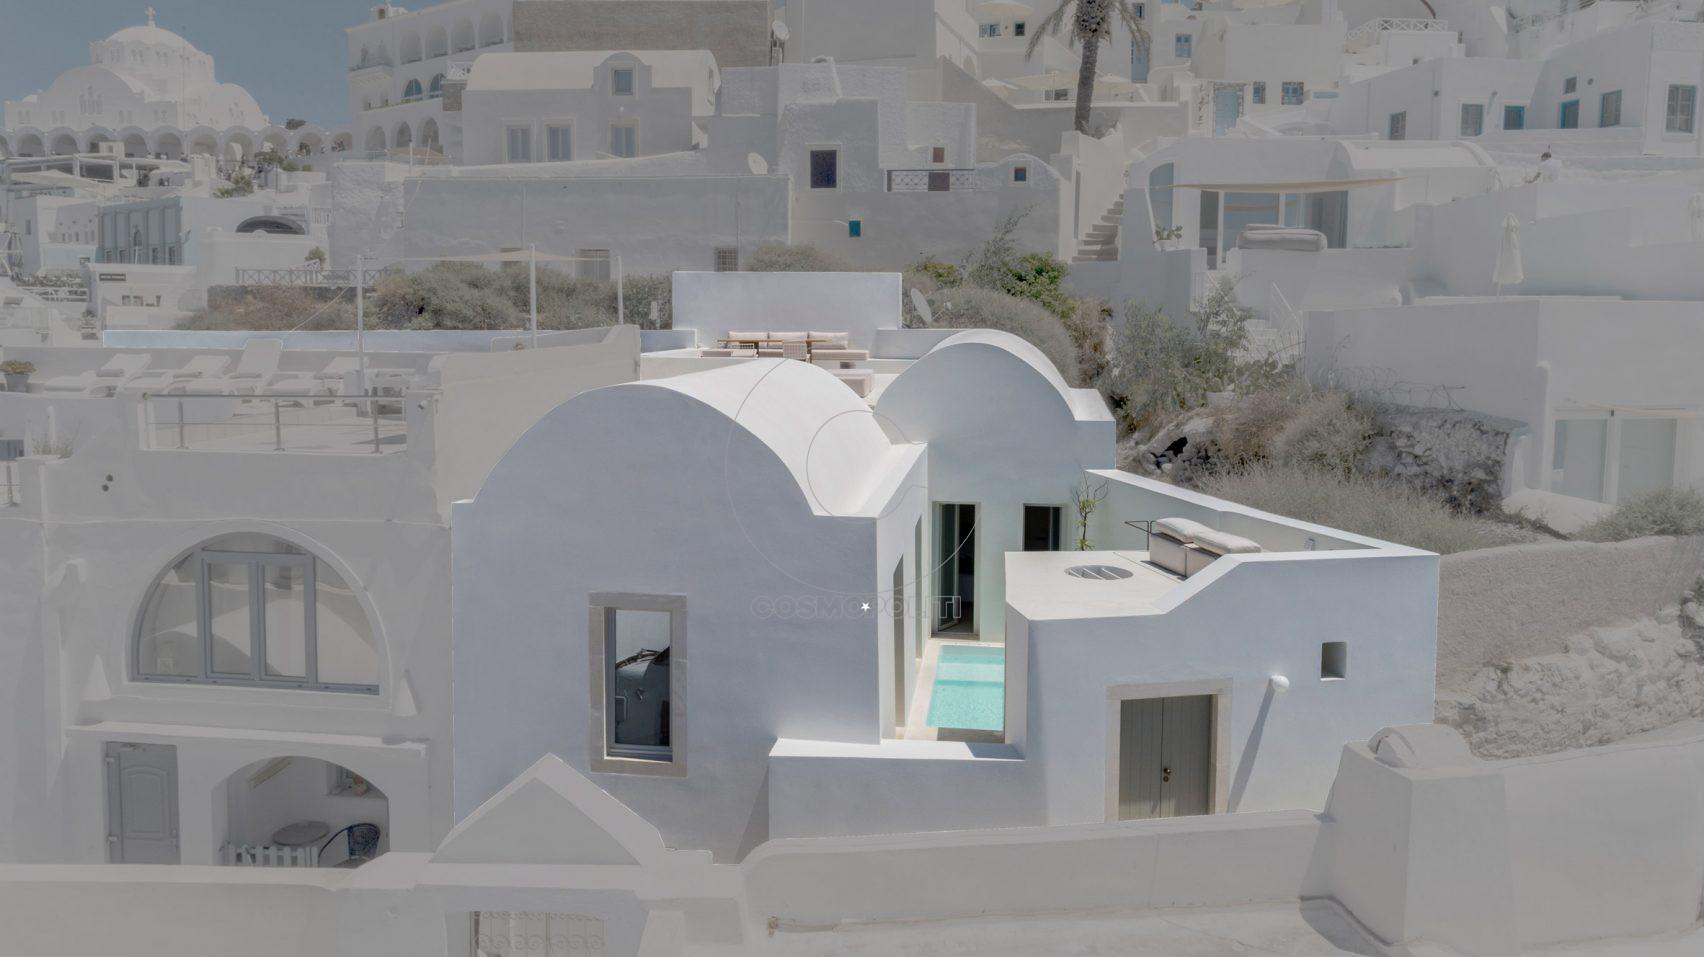 two-holiday-residences-fira-kapsimalis-architects-santorini-greece_dezeen_2364_col_0-1704x957